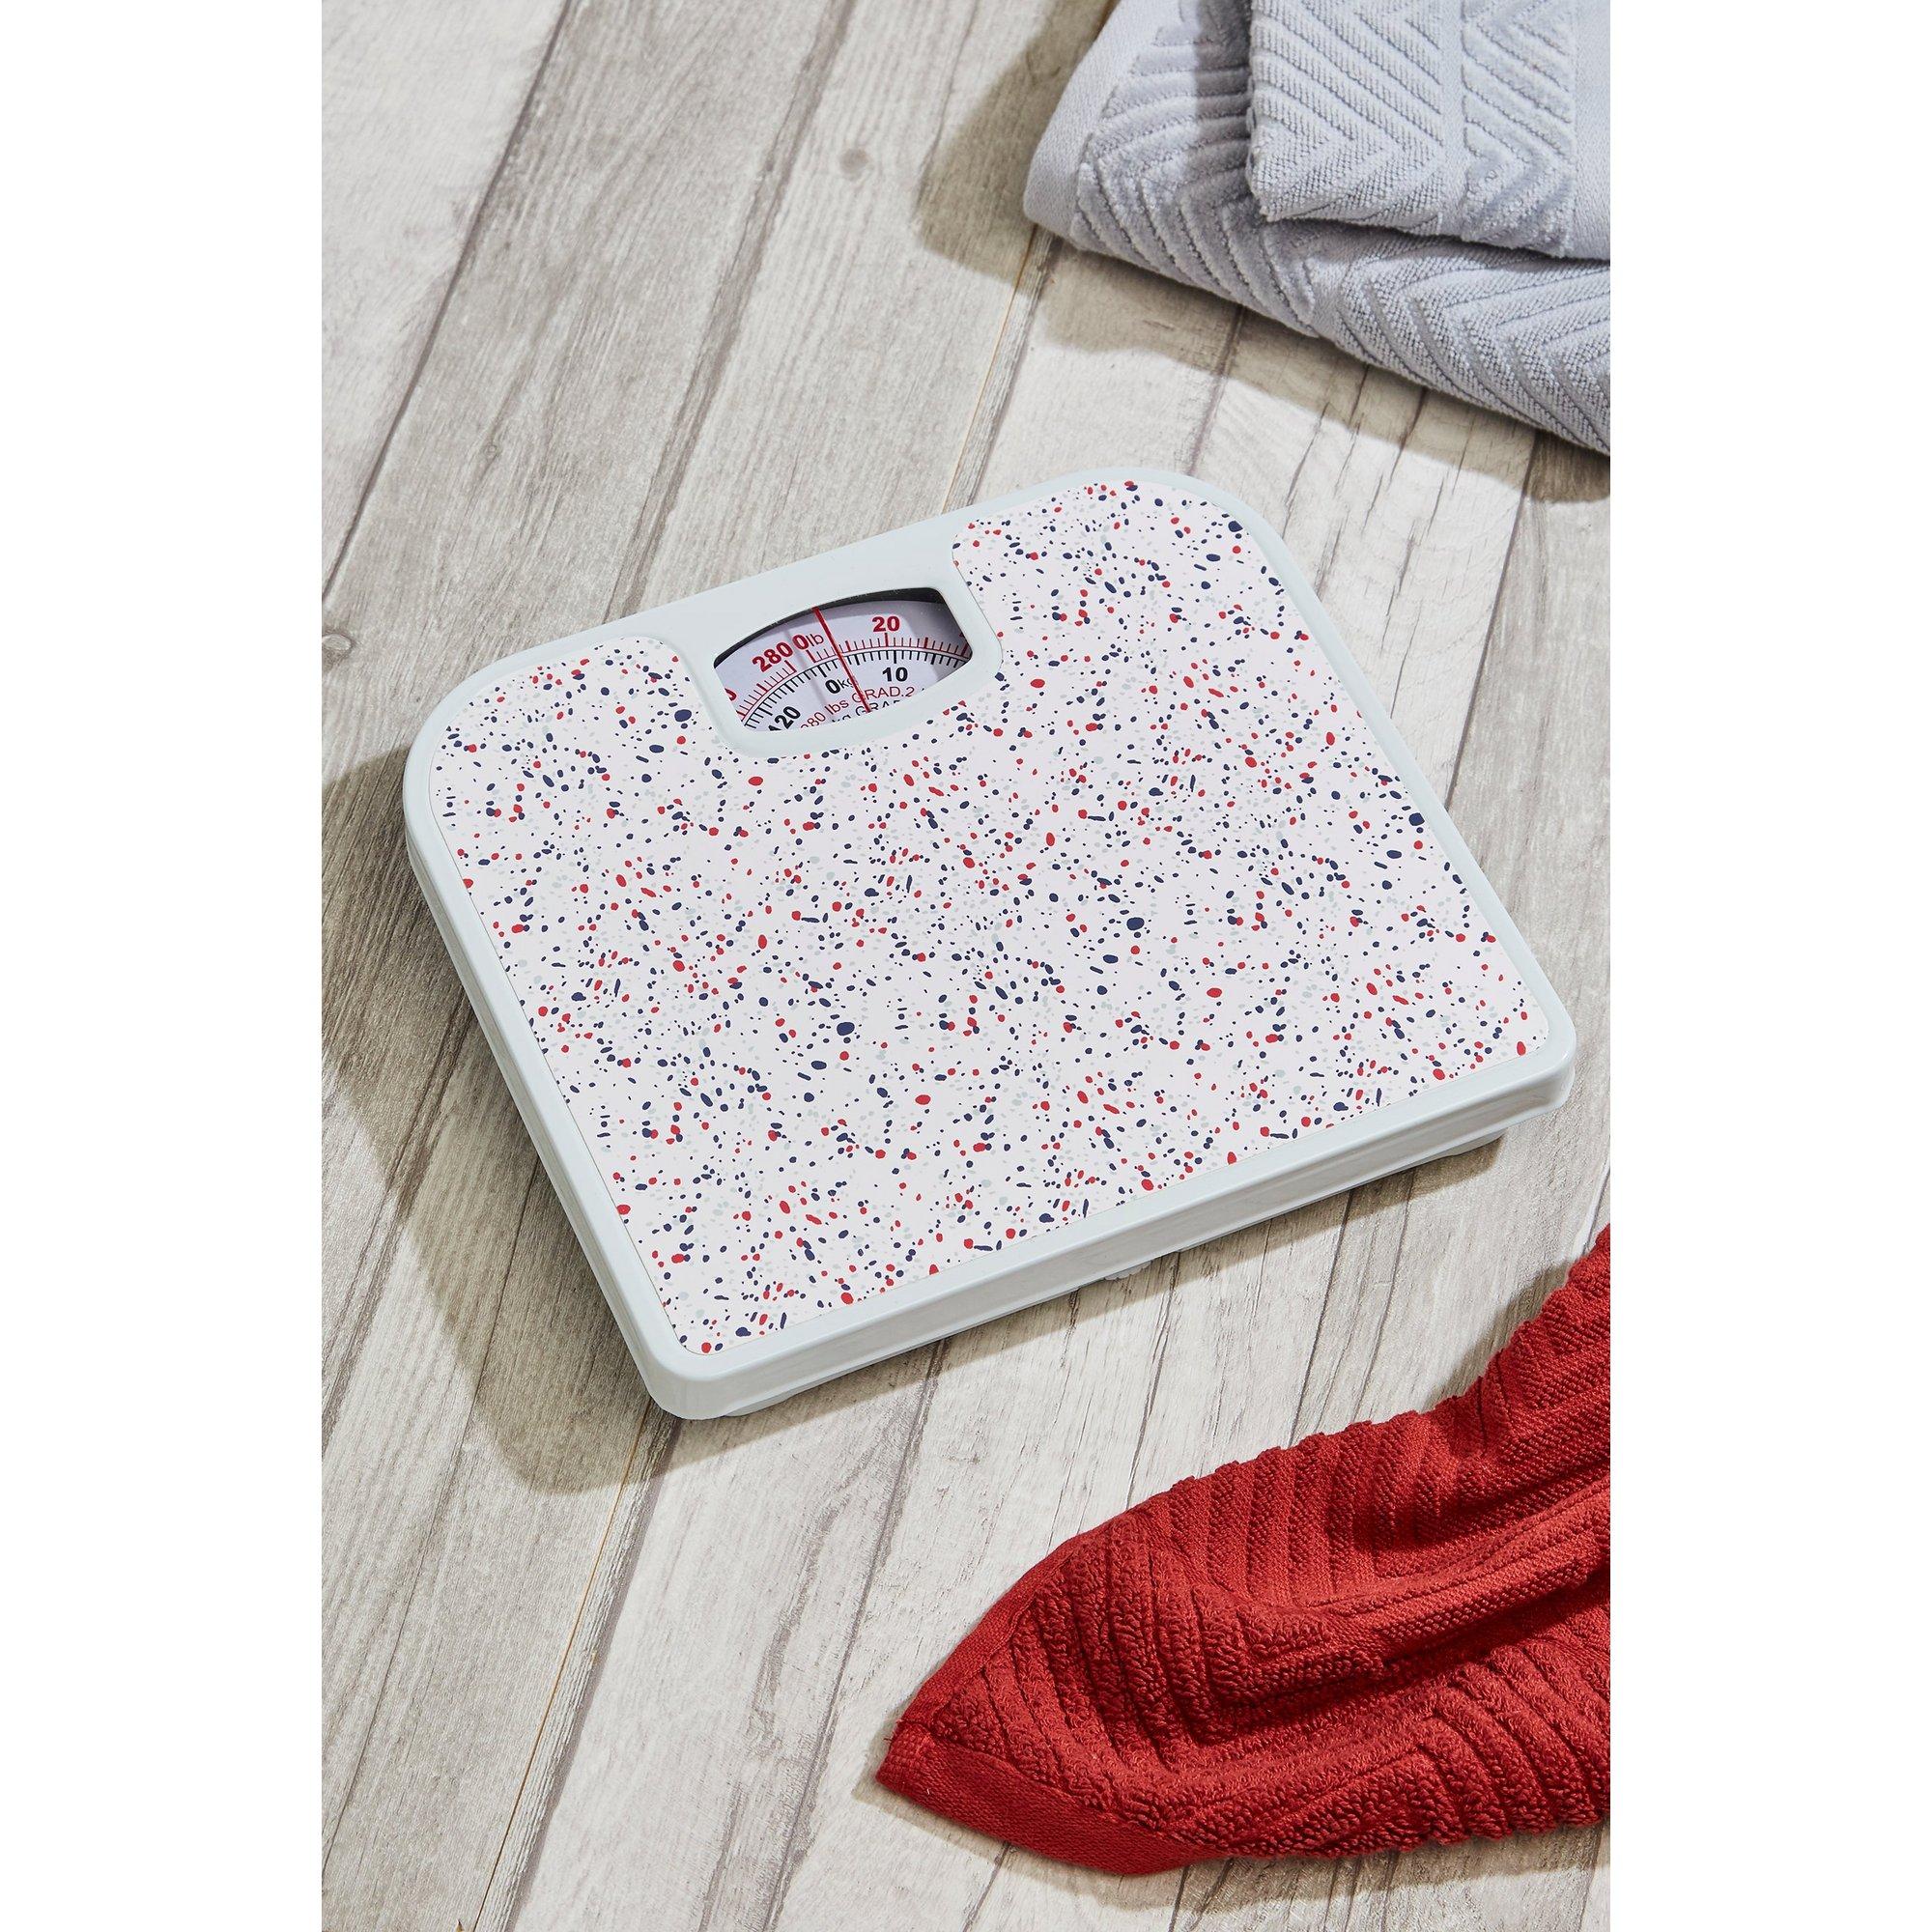 Image of Terrazzo Bathroom Scales